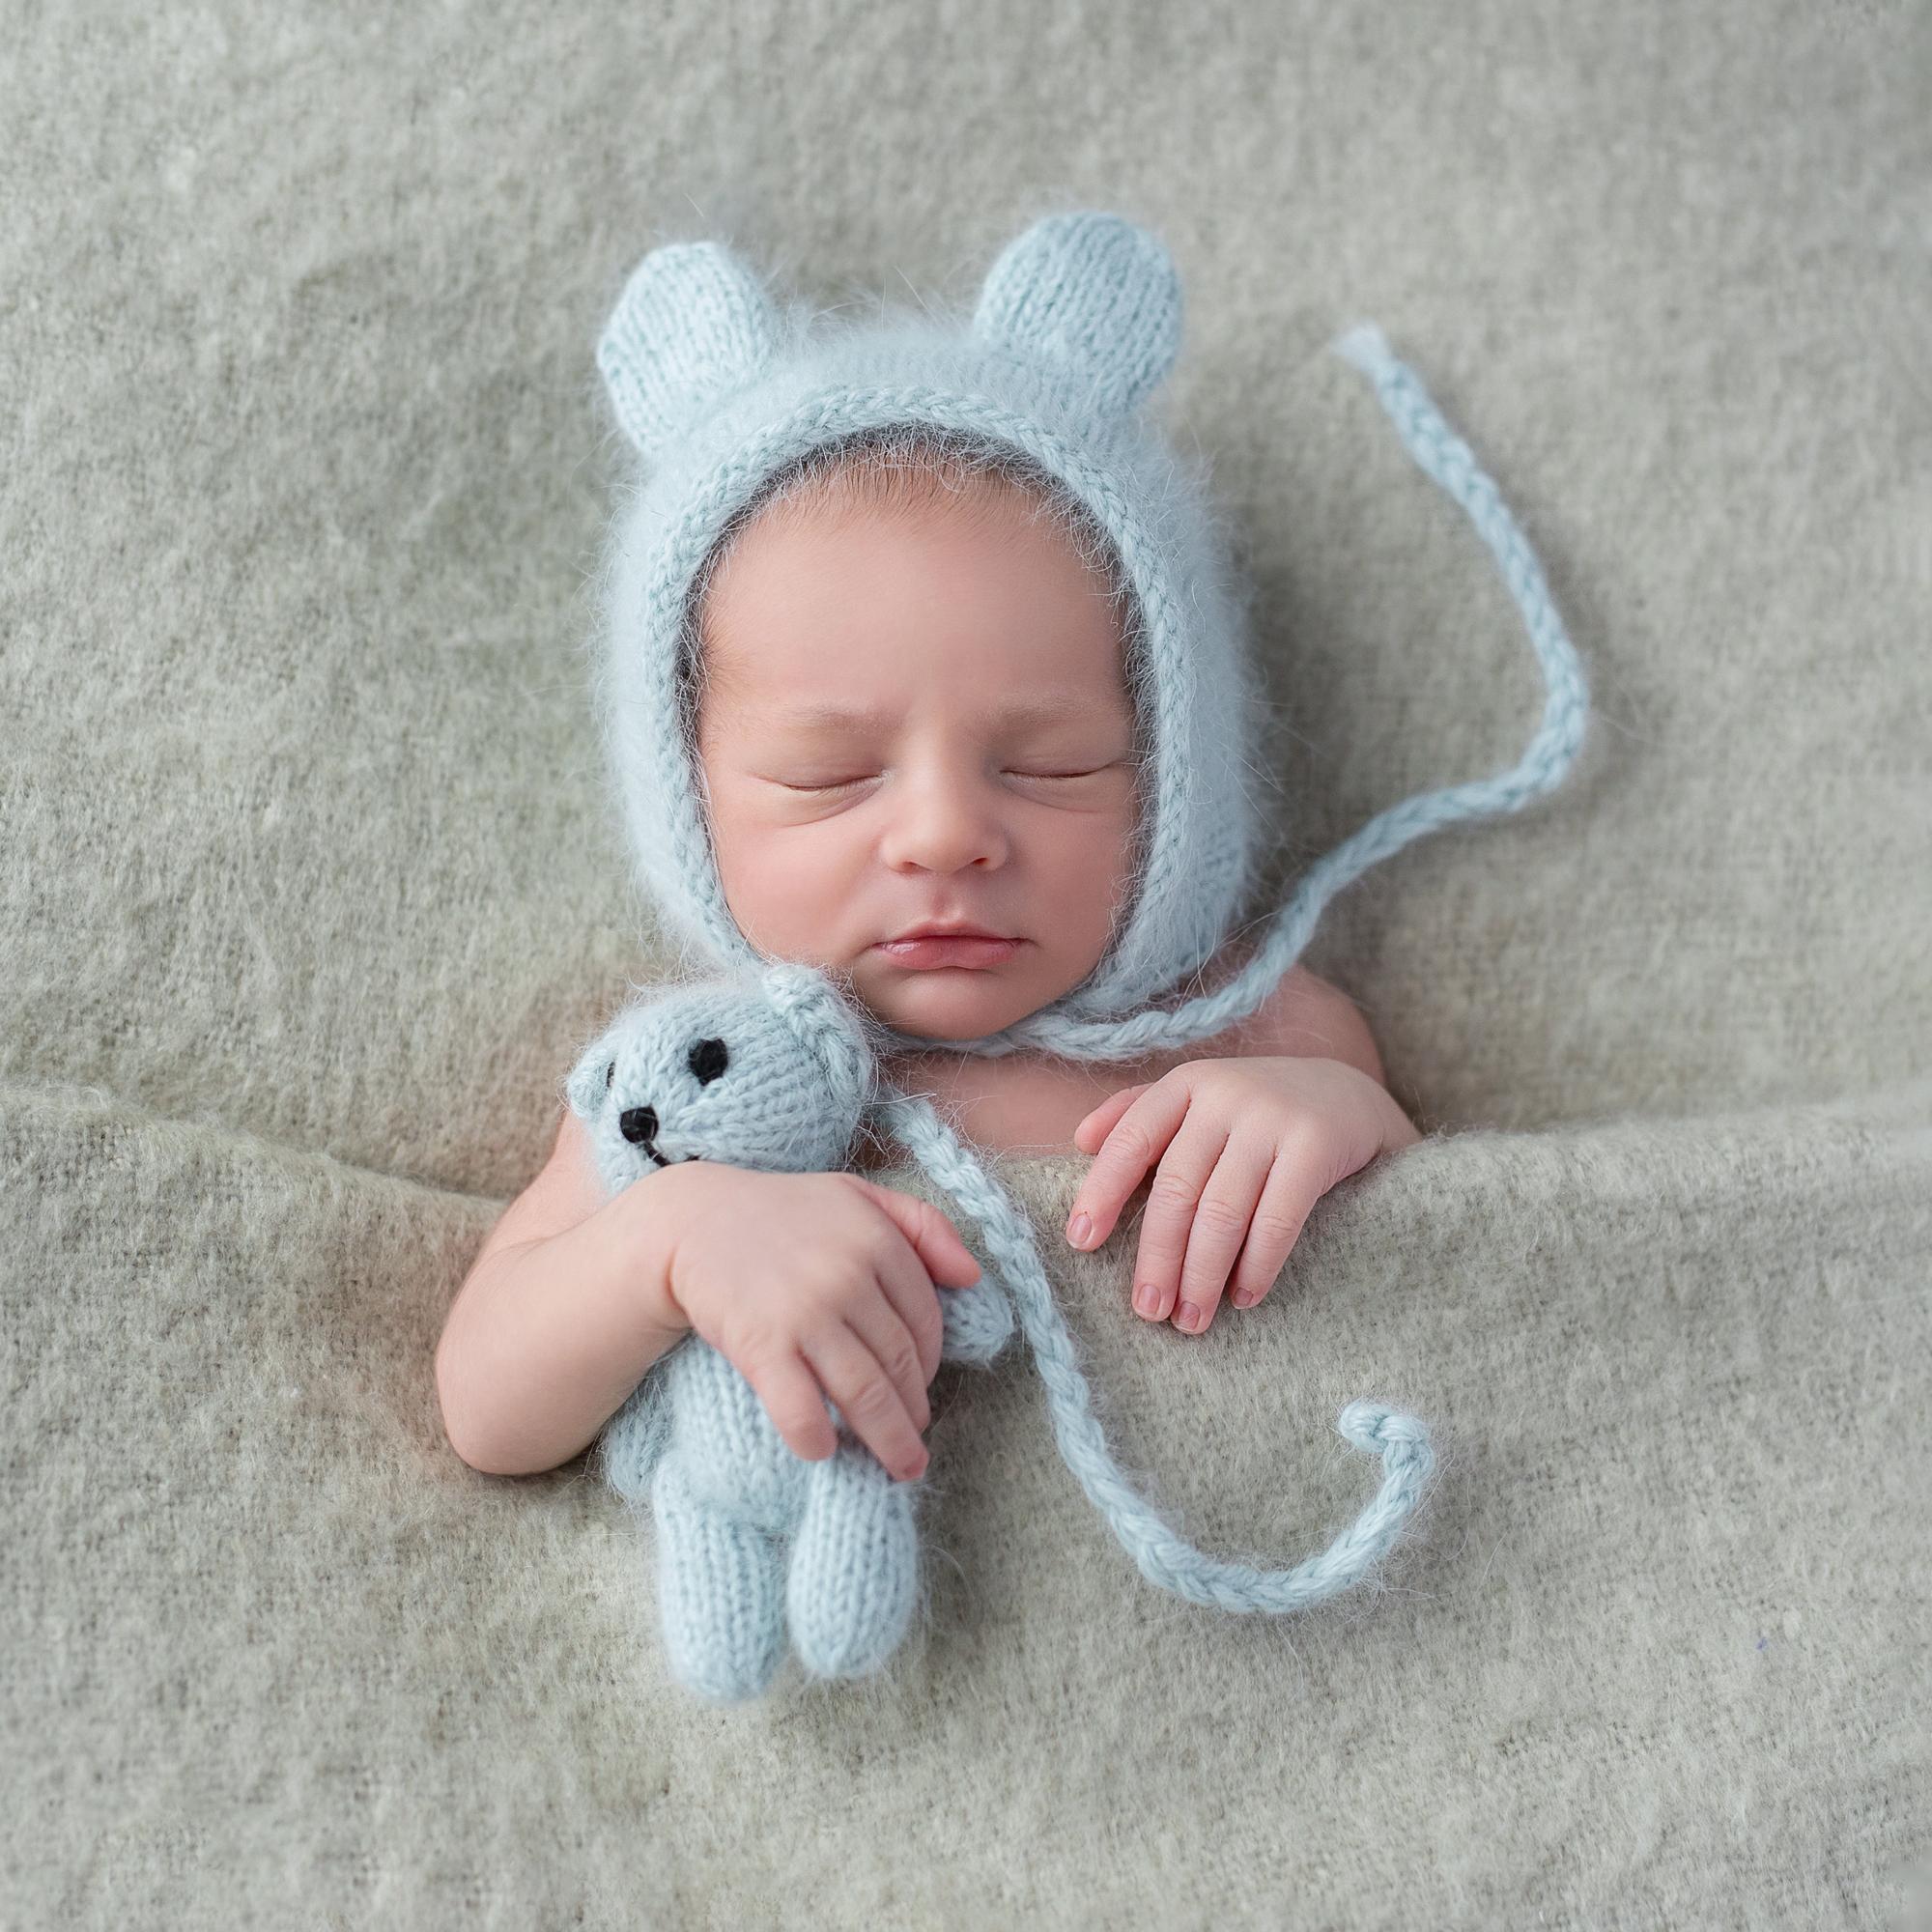 séance photo bébé naissance